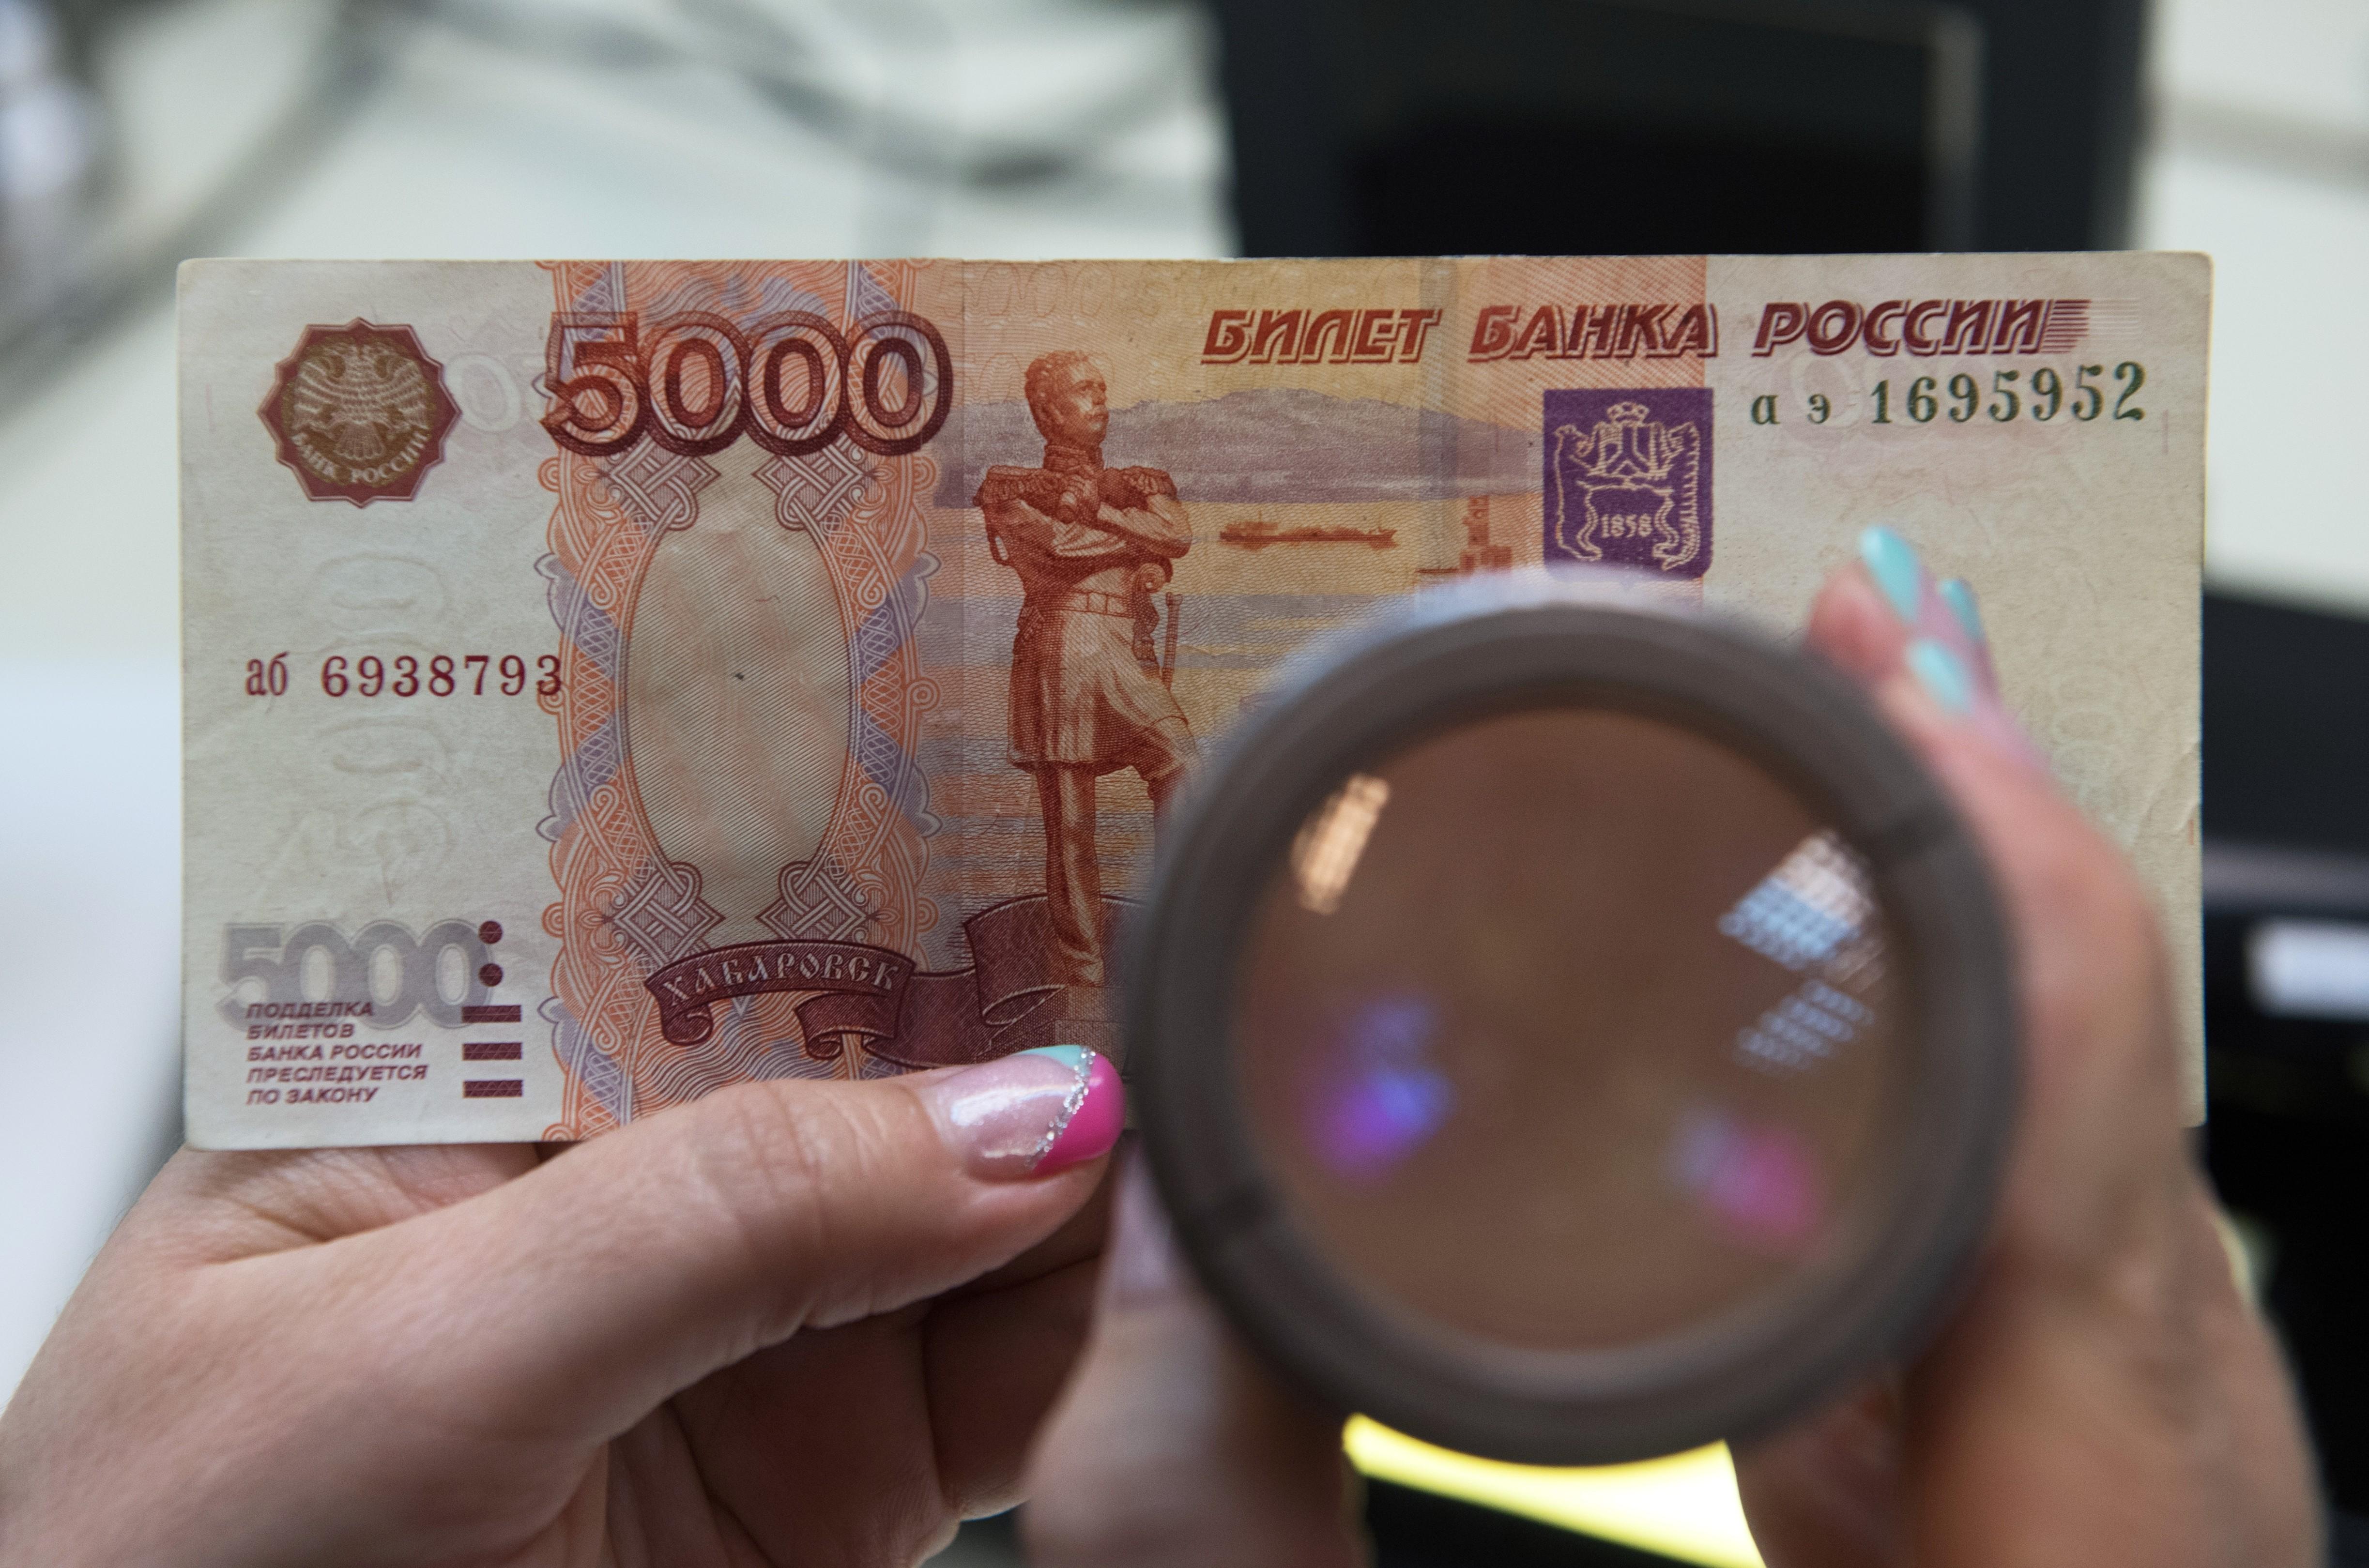 <p>Фото: &copy; РИА Новости/Илья Питалев</p>